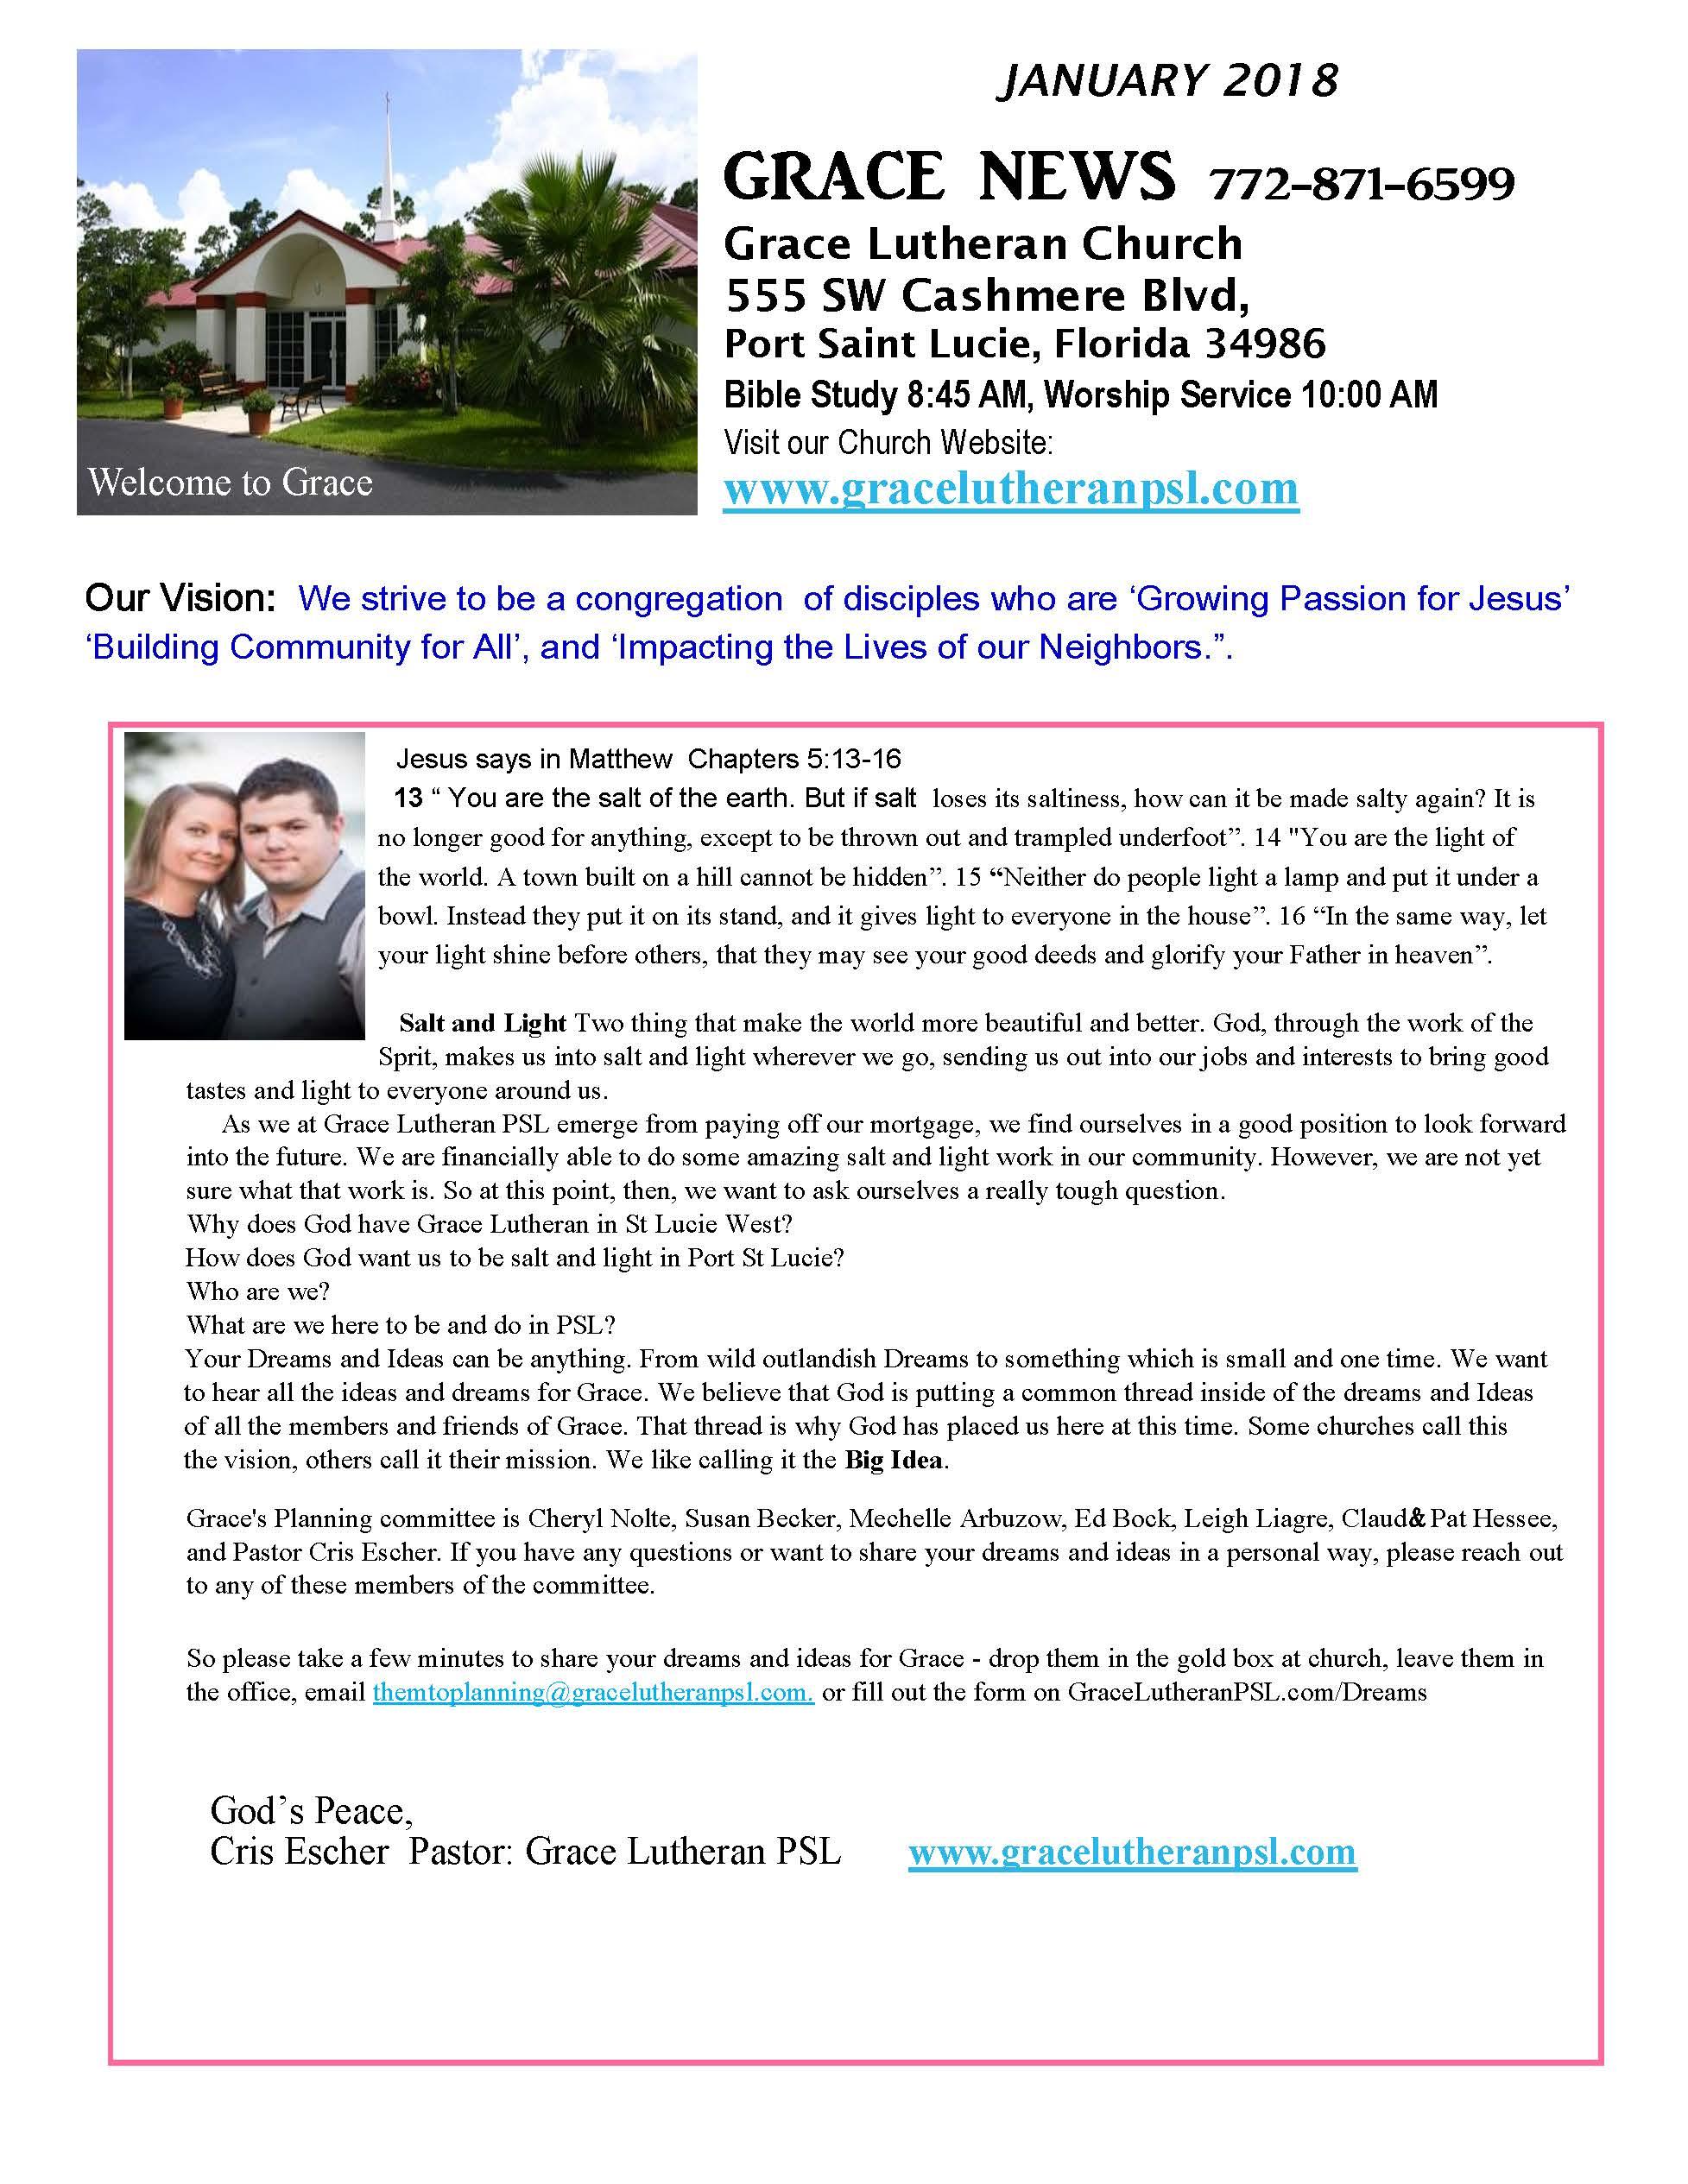 Grace News JAN 2018 pub (1)_Page_01.jpg